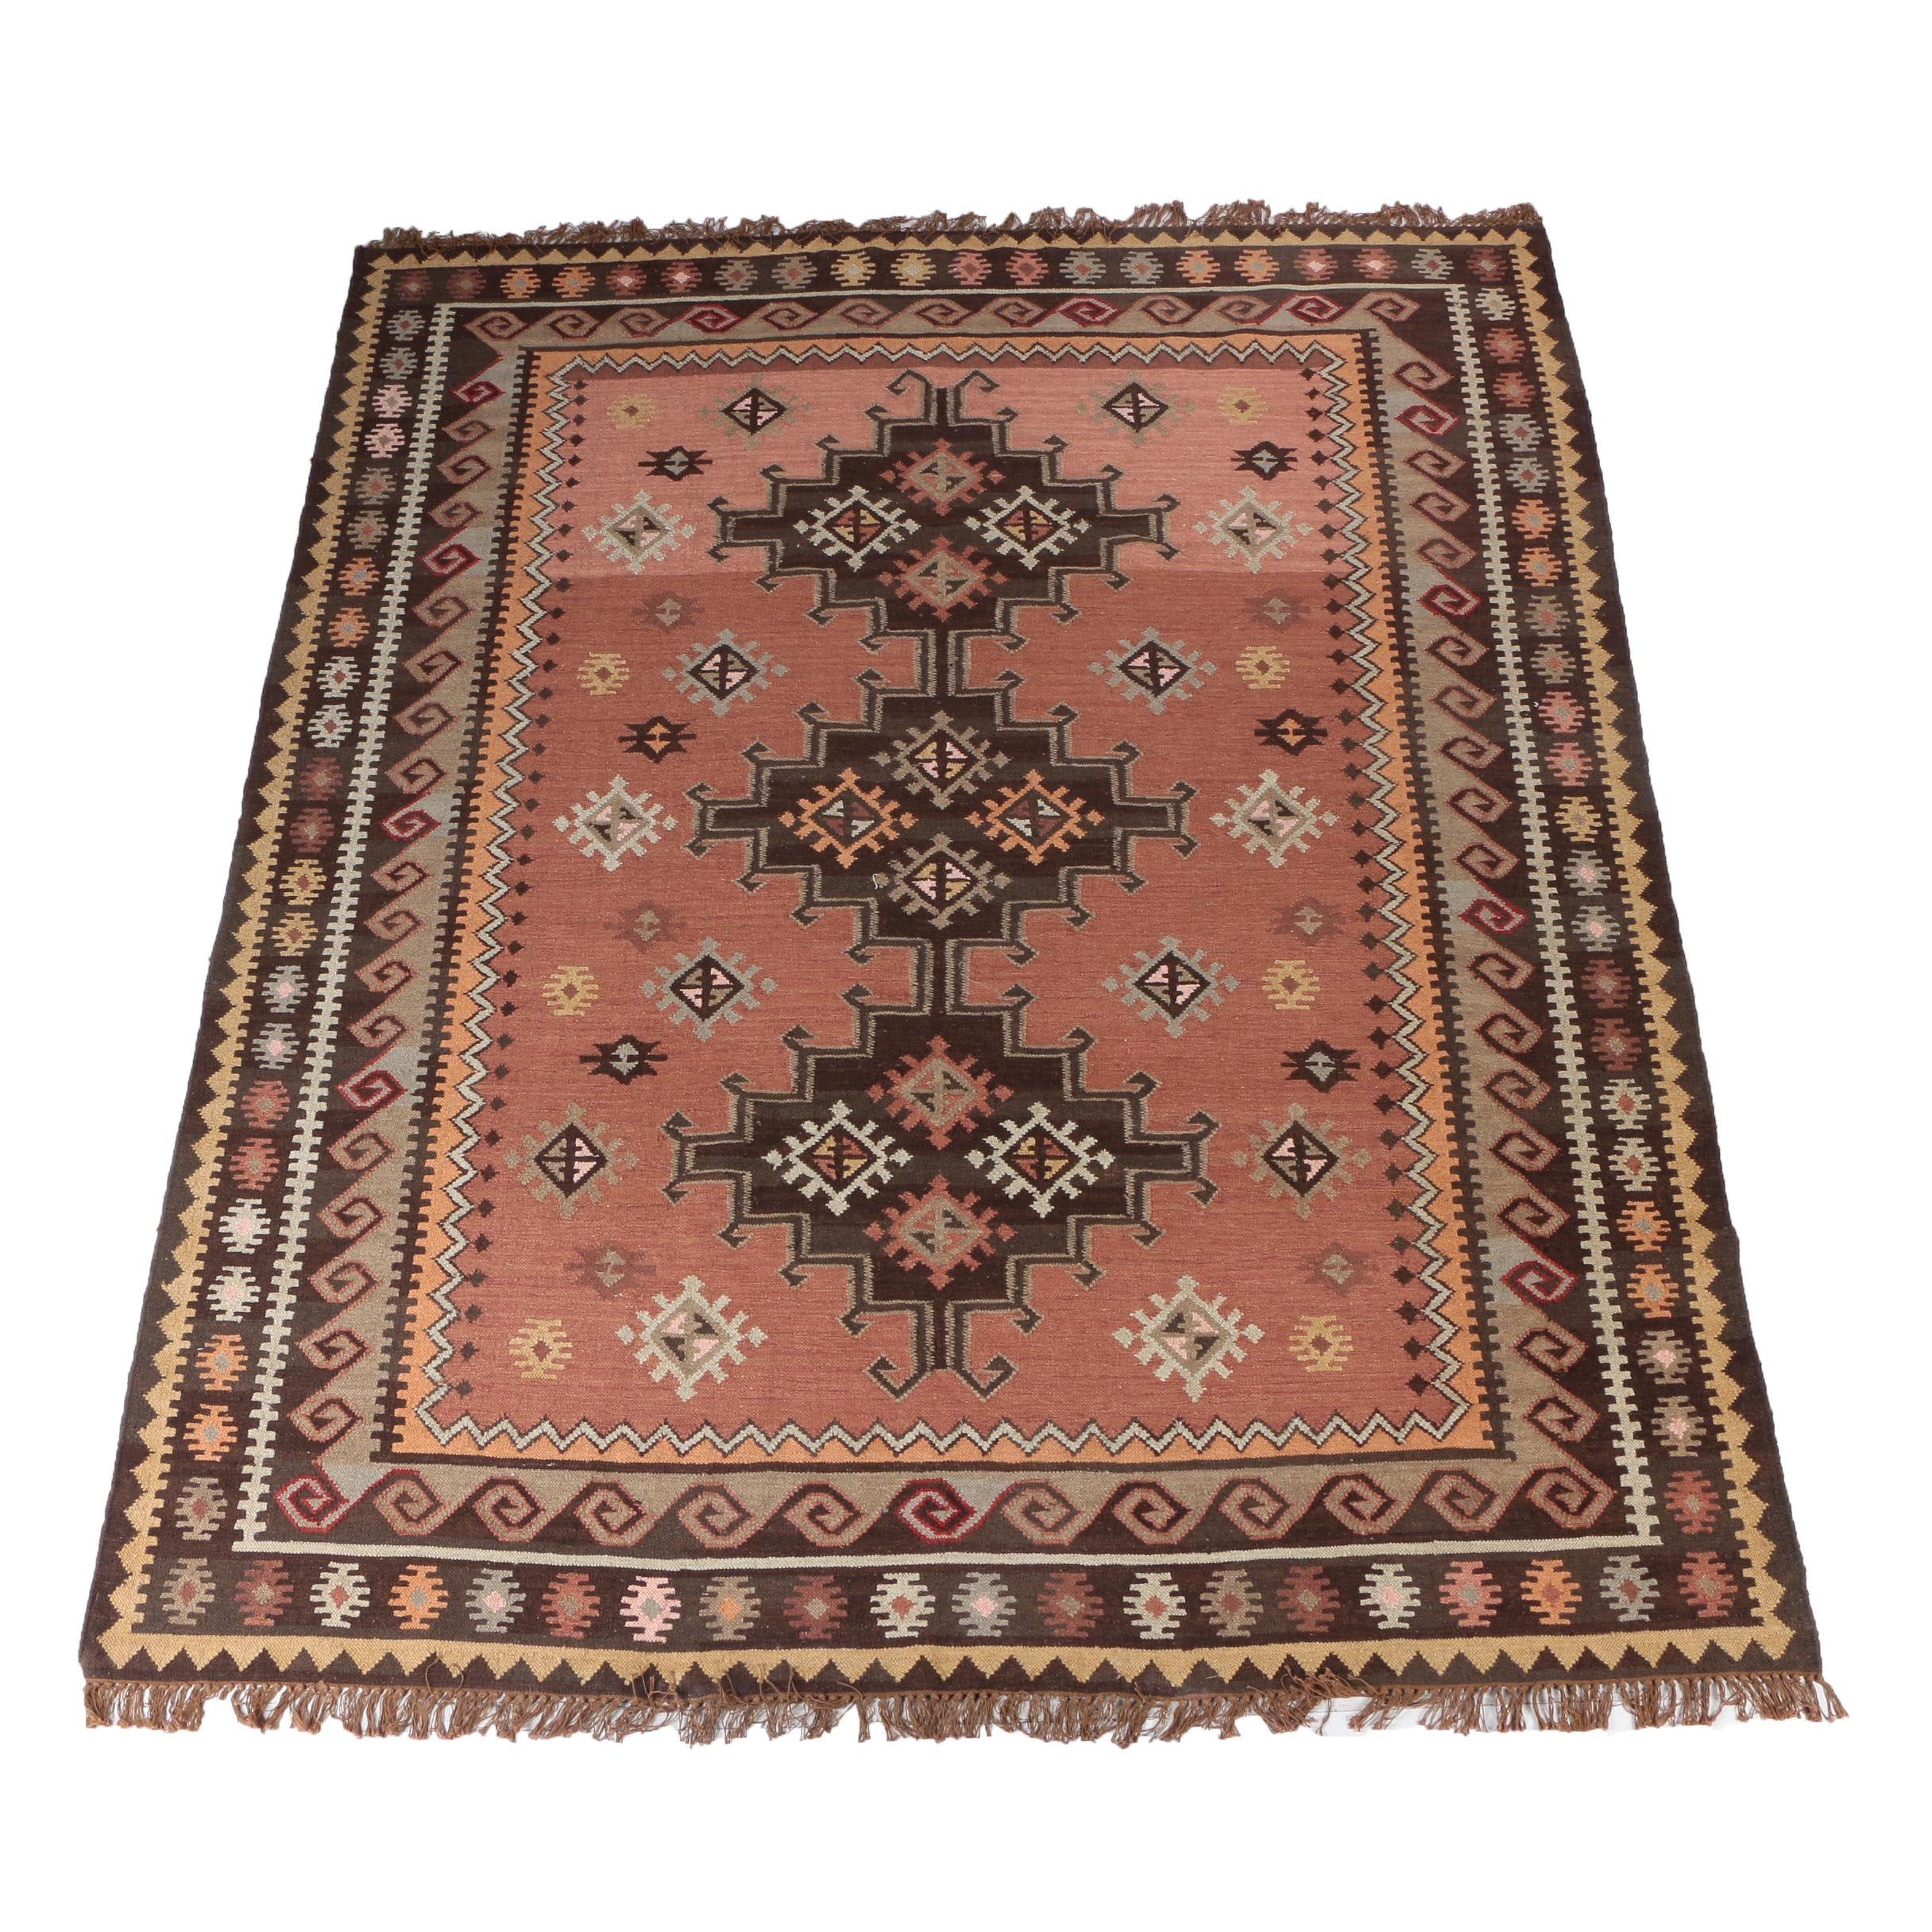 Handwoven Kazak Style Kilim Wool Area Rug